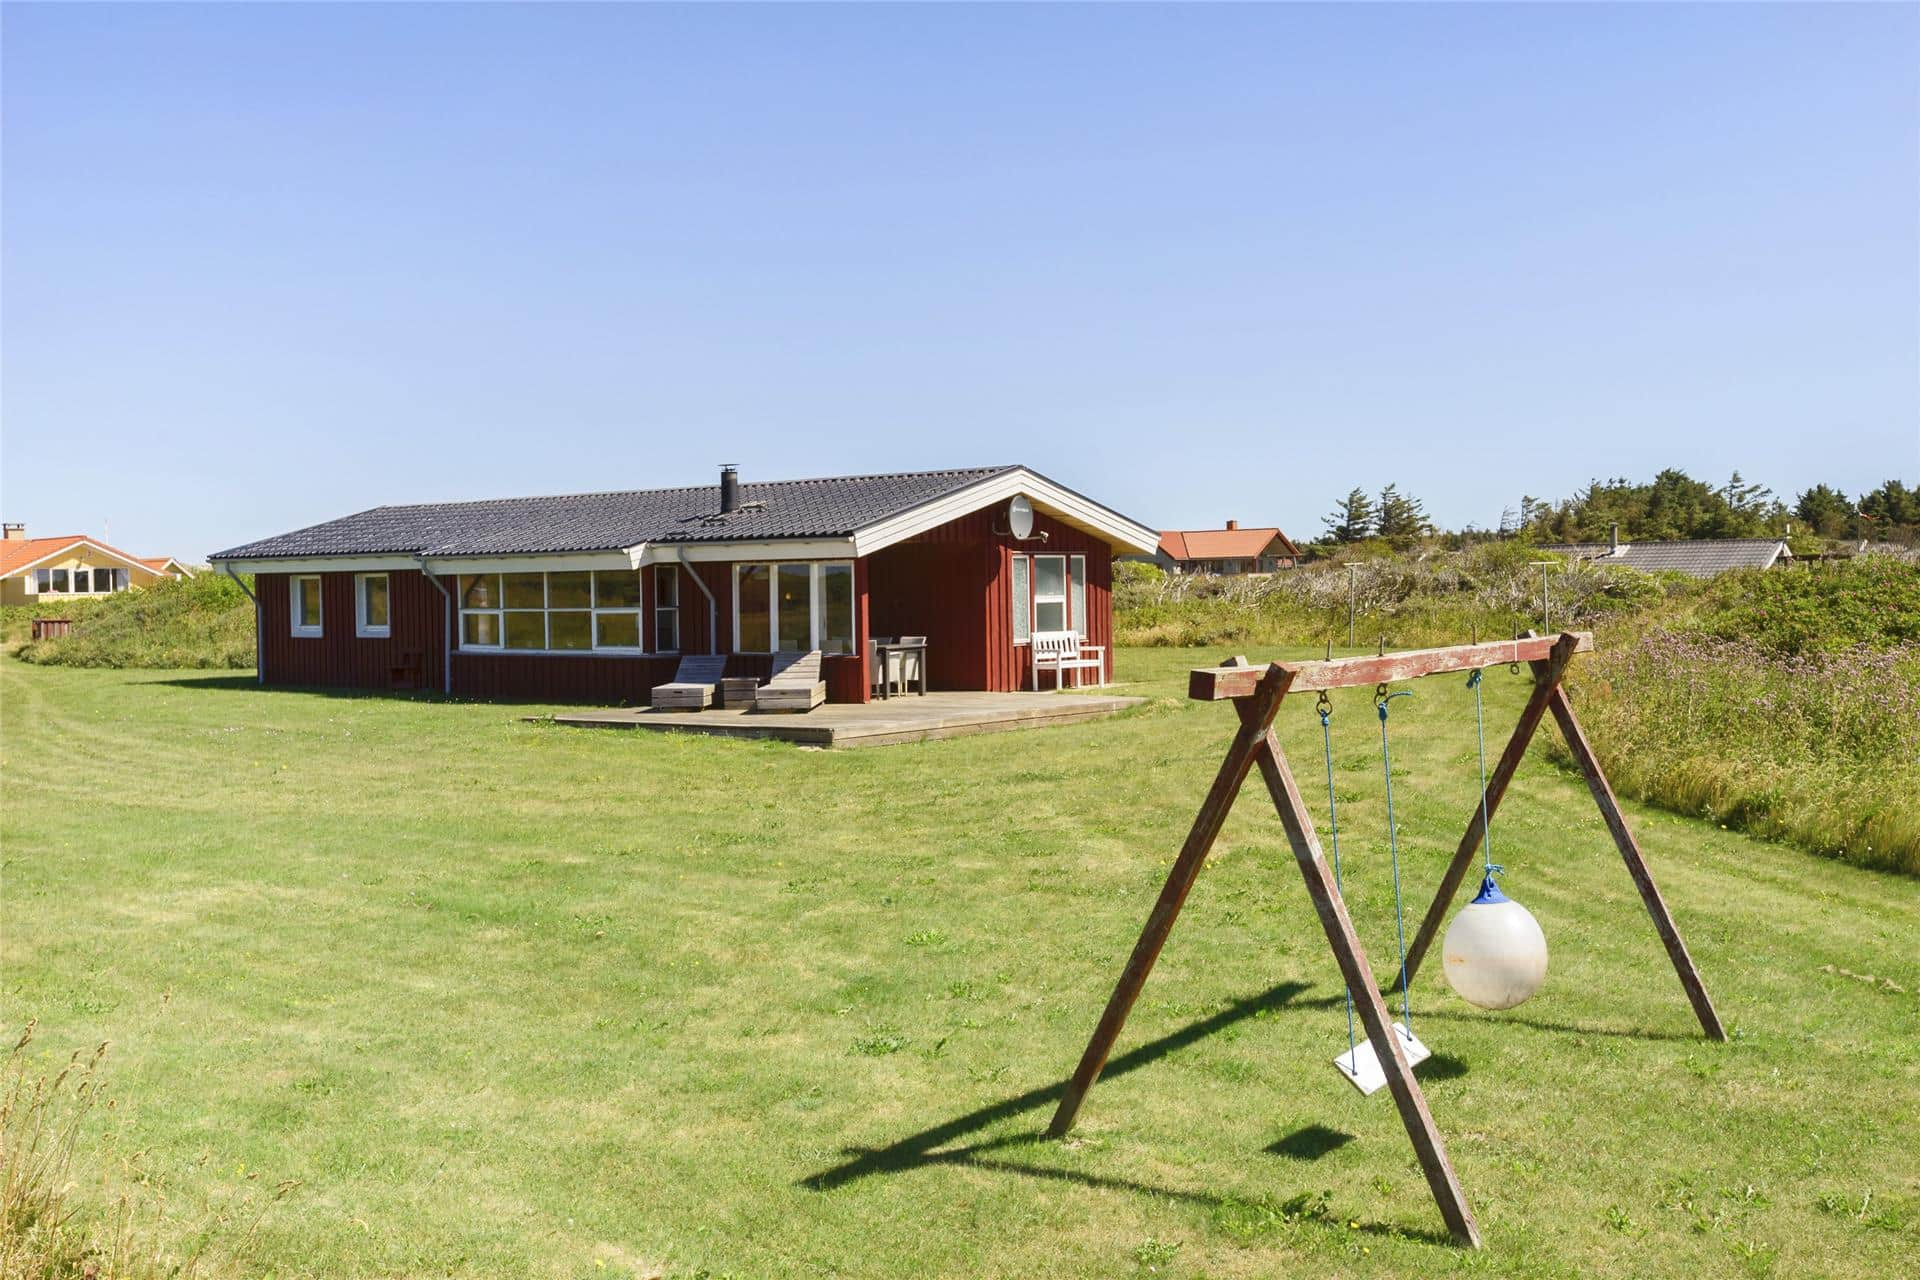 Bild 1-14 Ferienhaus 1512, Grindevej 3, DK - 9480 Løkken